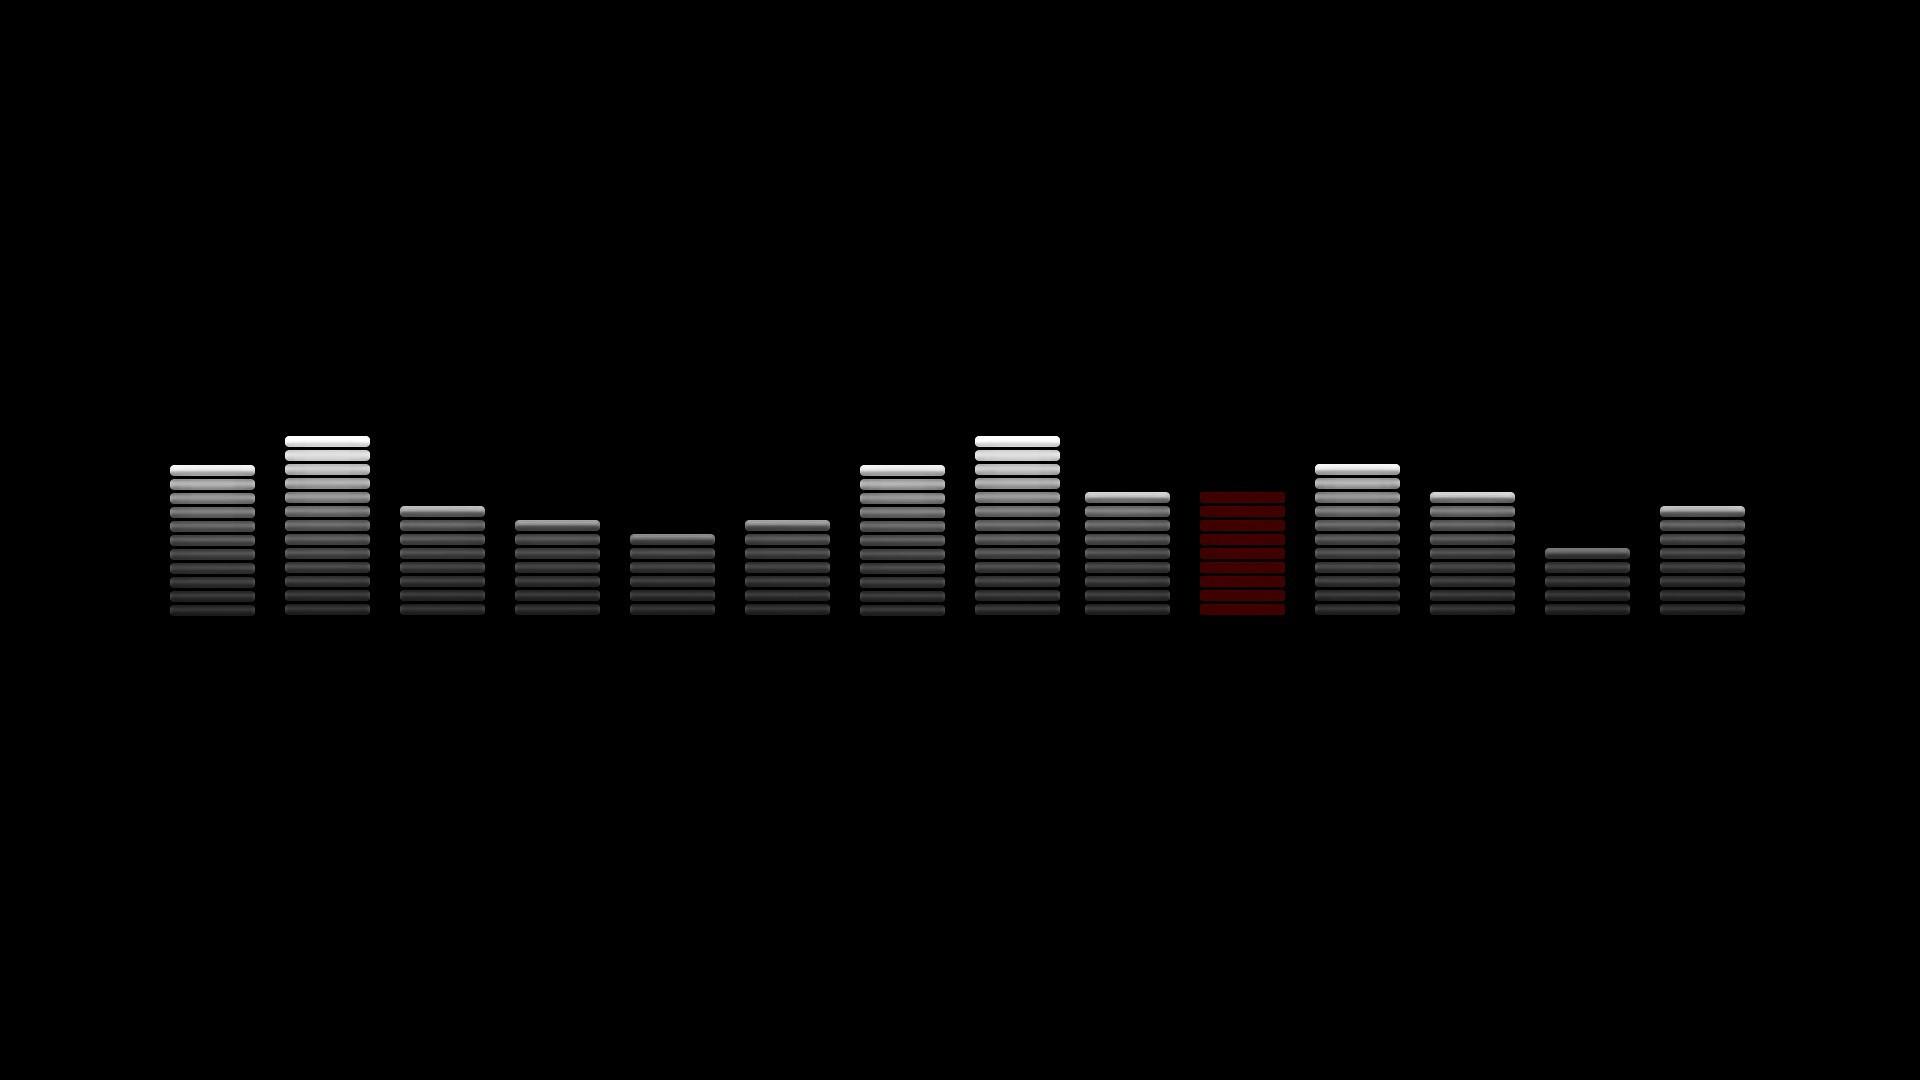 Dark Abstract Music